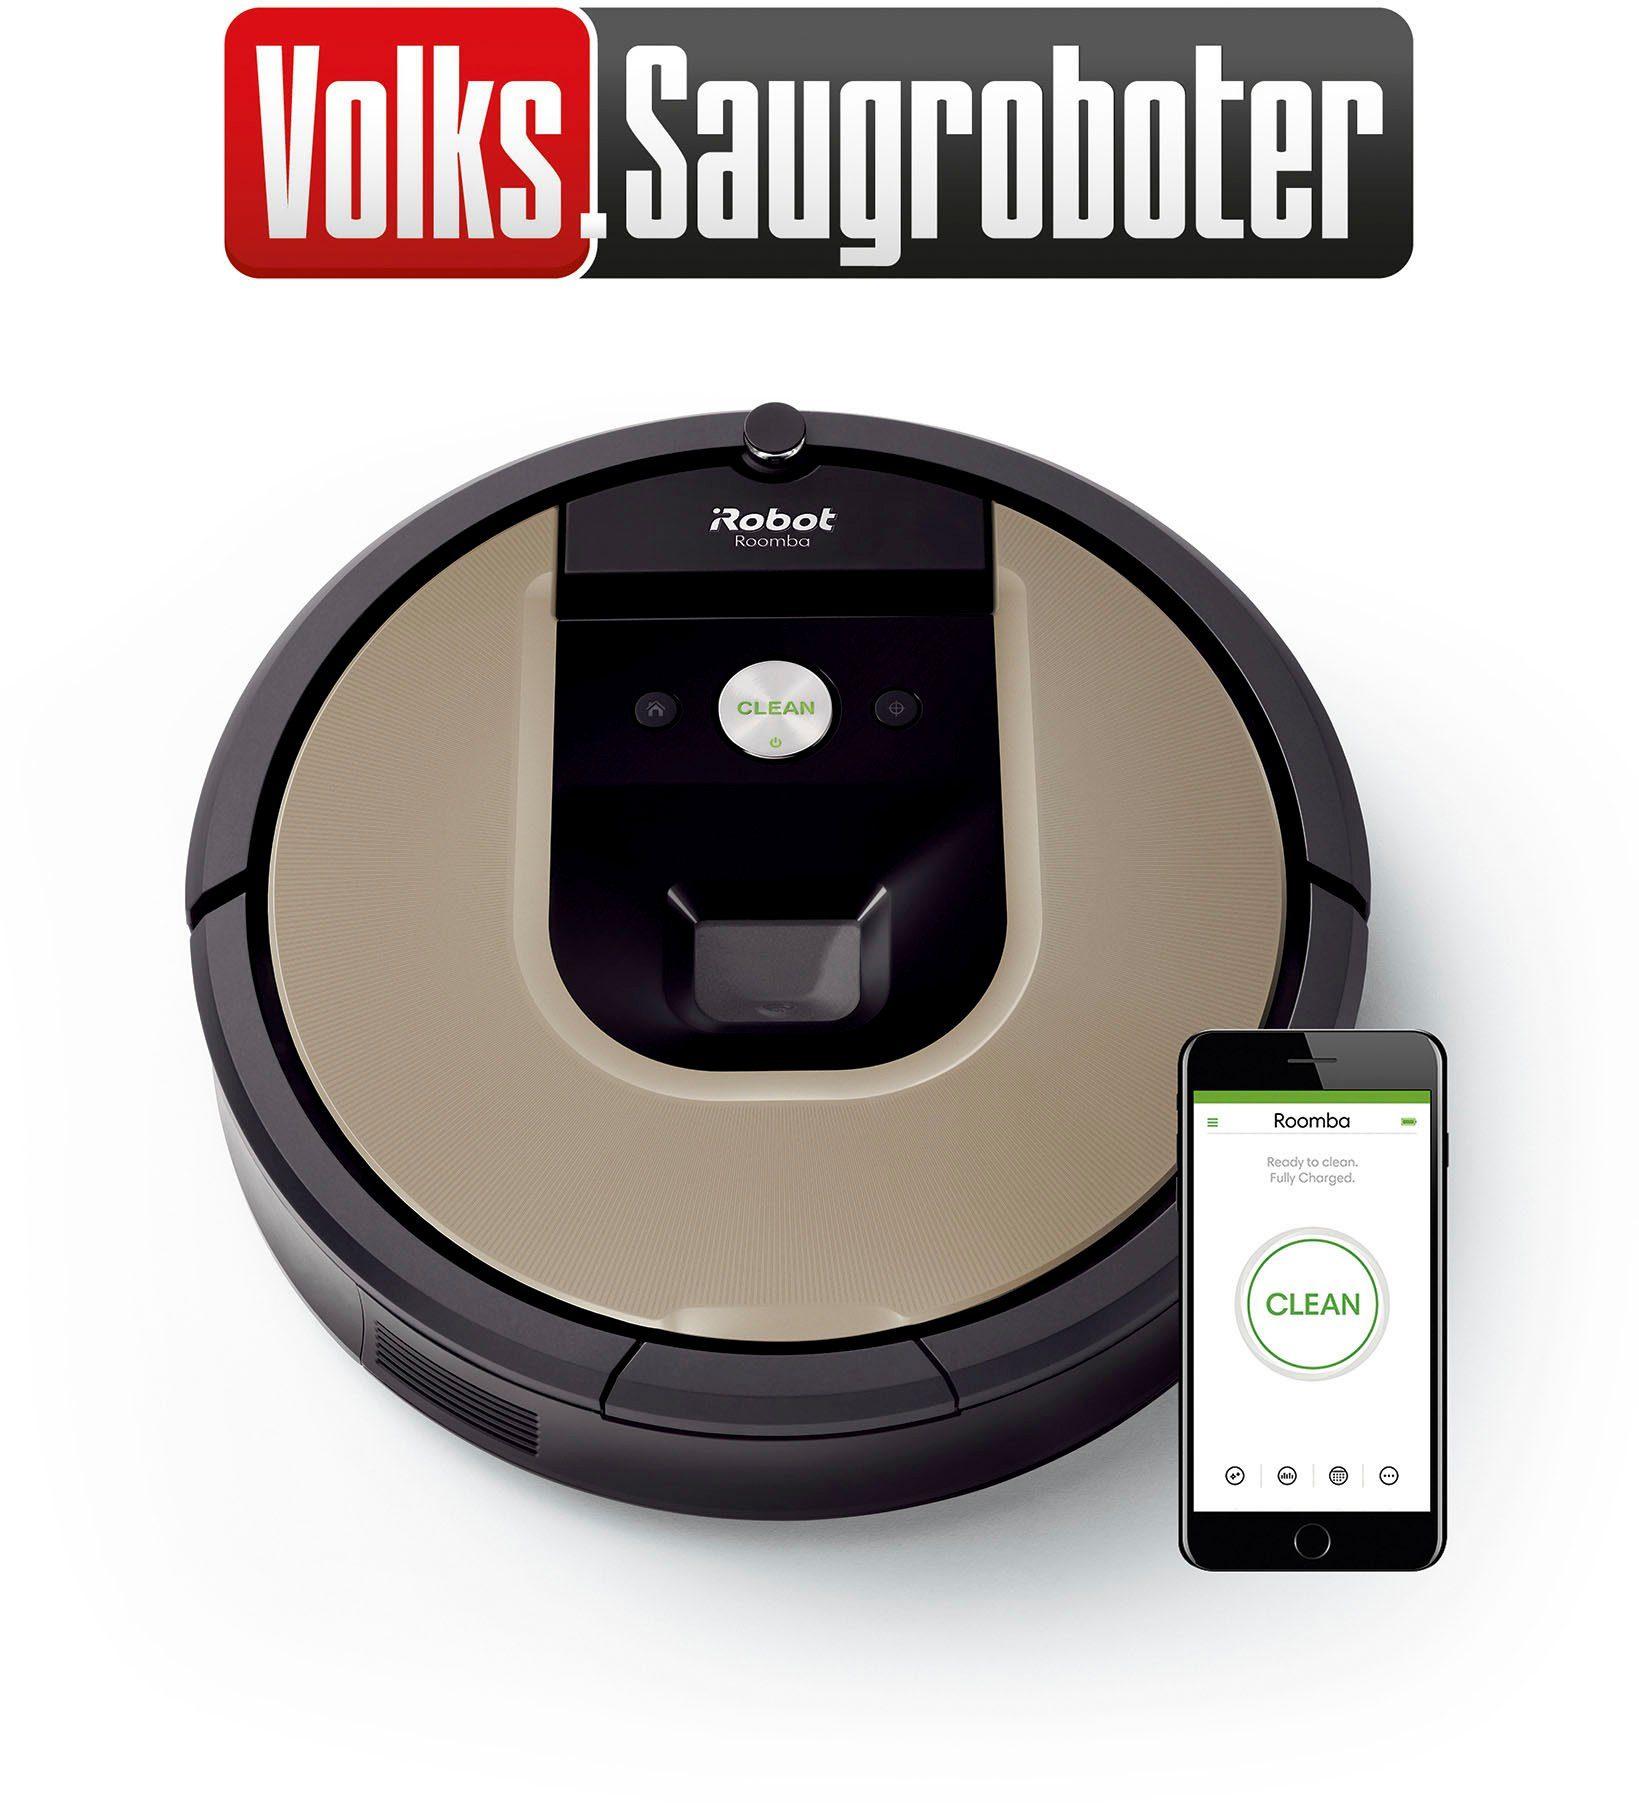 (elektro-billiger.net) iRobot Saugroboter Roomba 966, Volks-Saugroboter, Appfähig